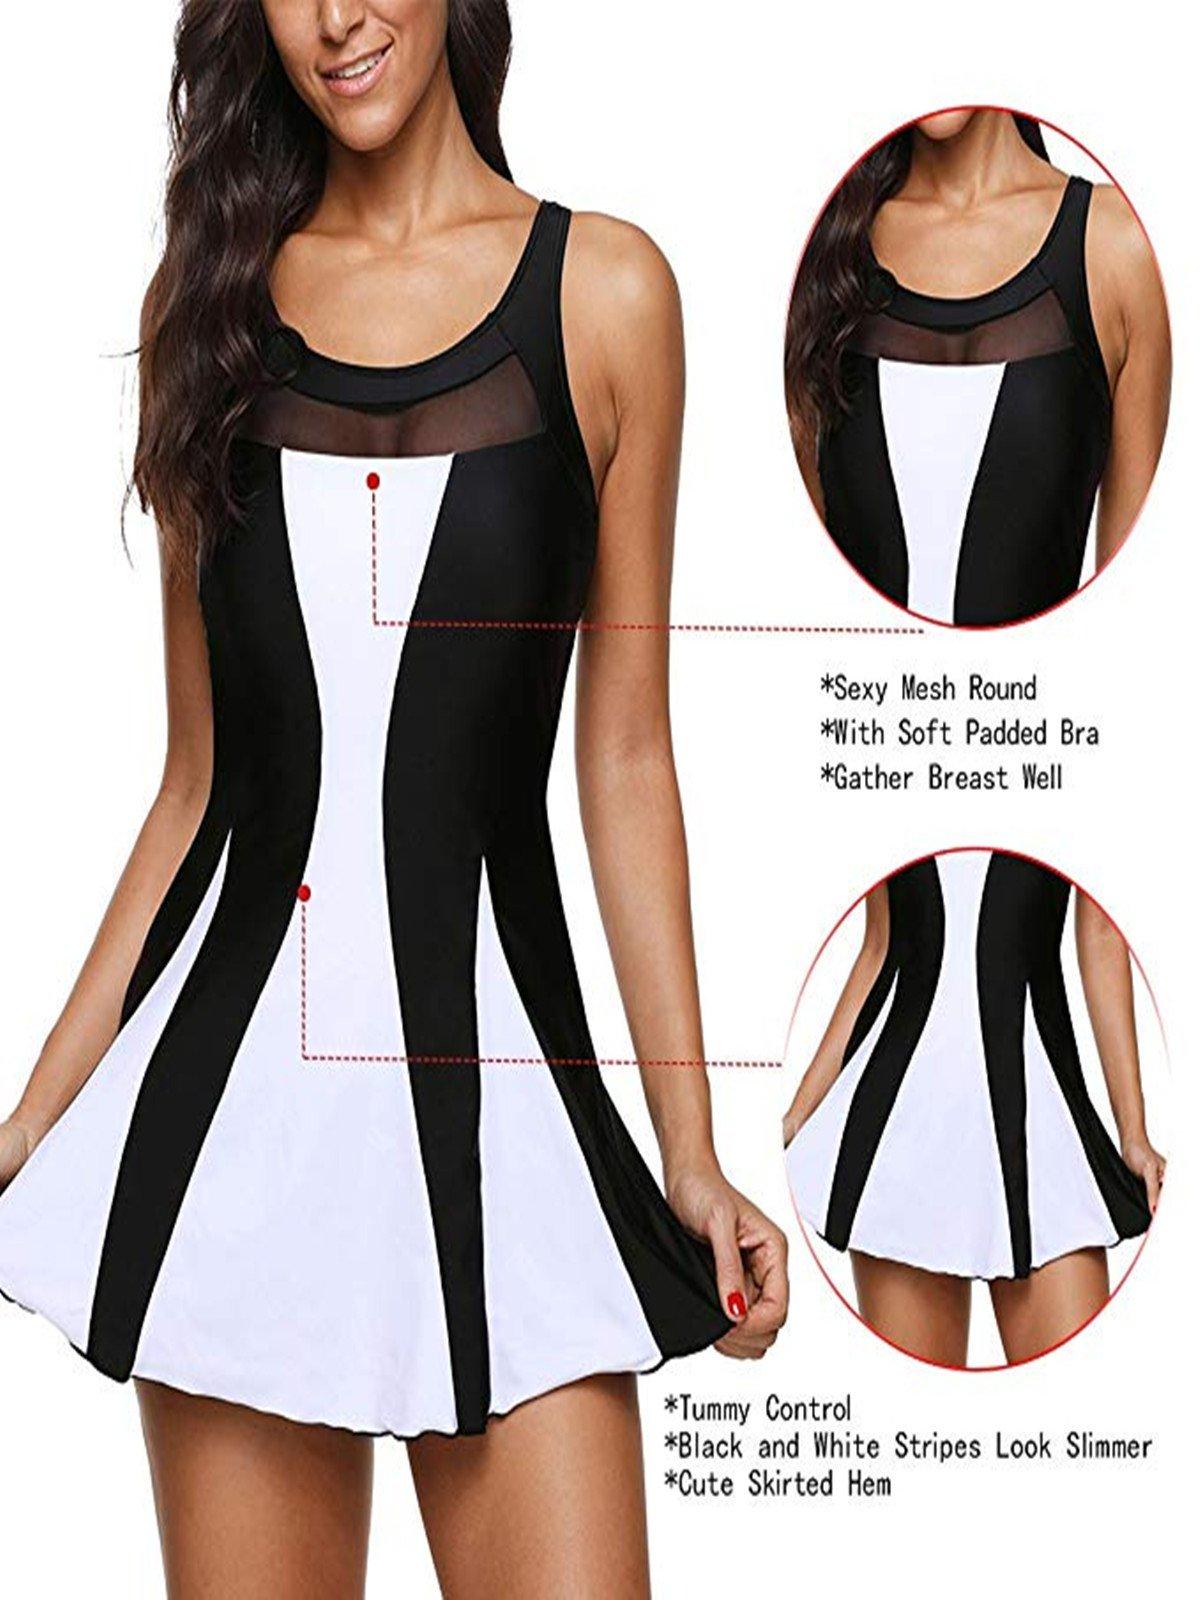 Century Star Women's Elegant Dress One Piece Boy-Leg Bathing Suit Swimdress Printed Swimwear Swimsuits Black White XL(US 12-14) by Century Star (Image #5)